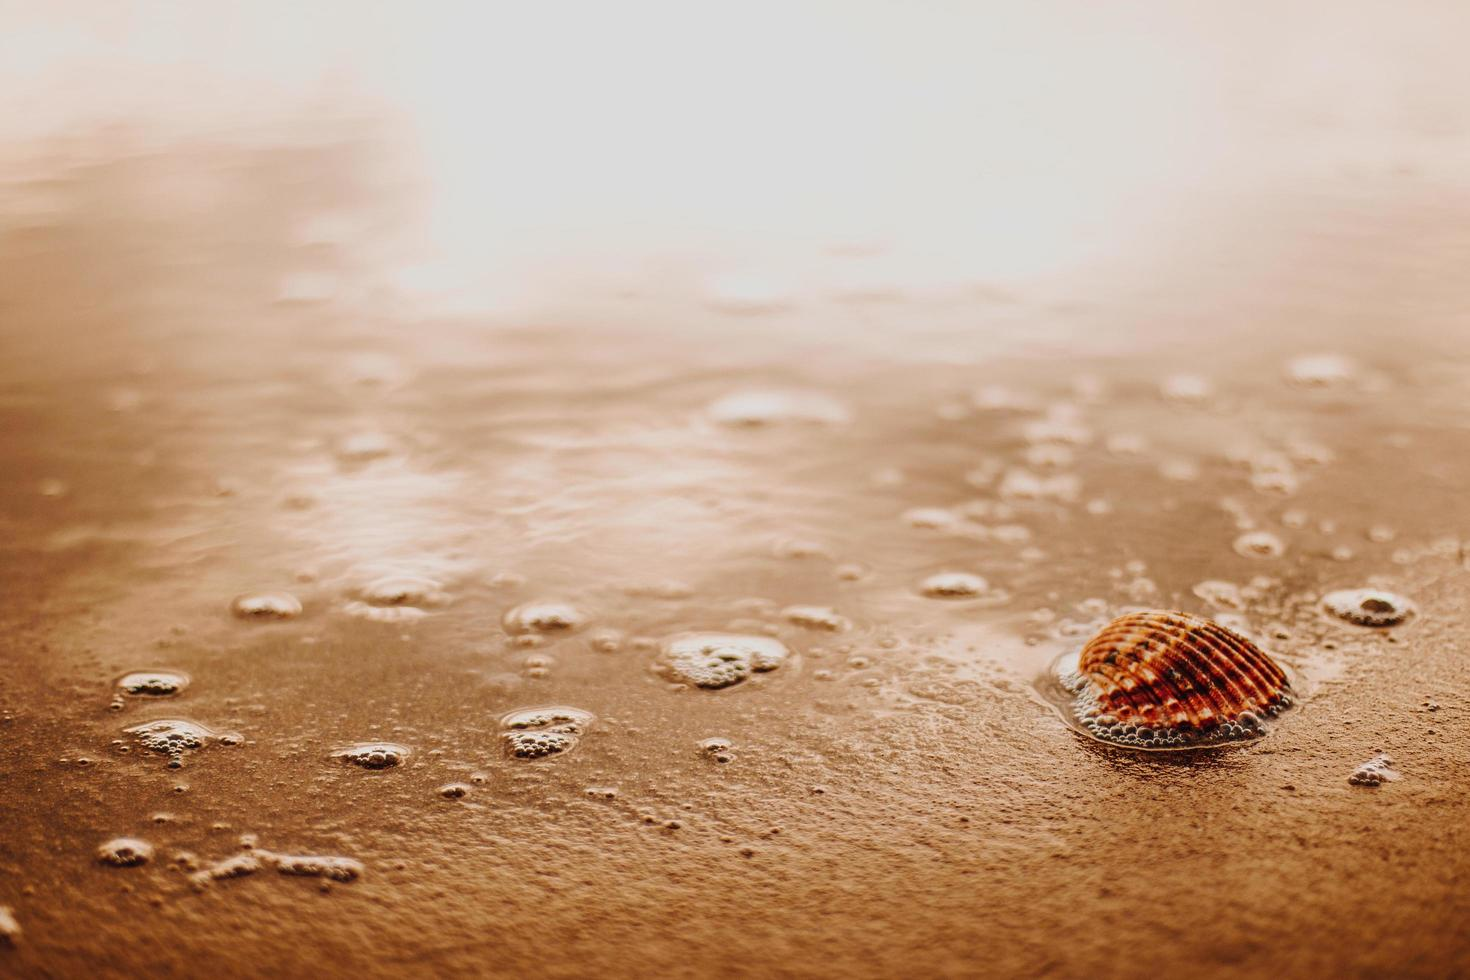 coquillage sur sable brun photo